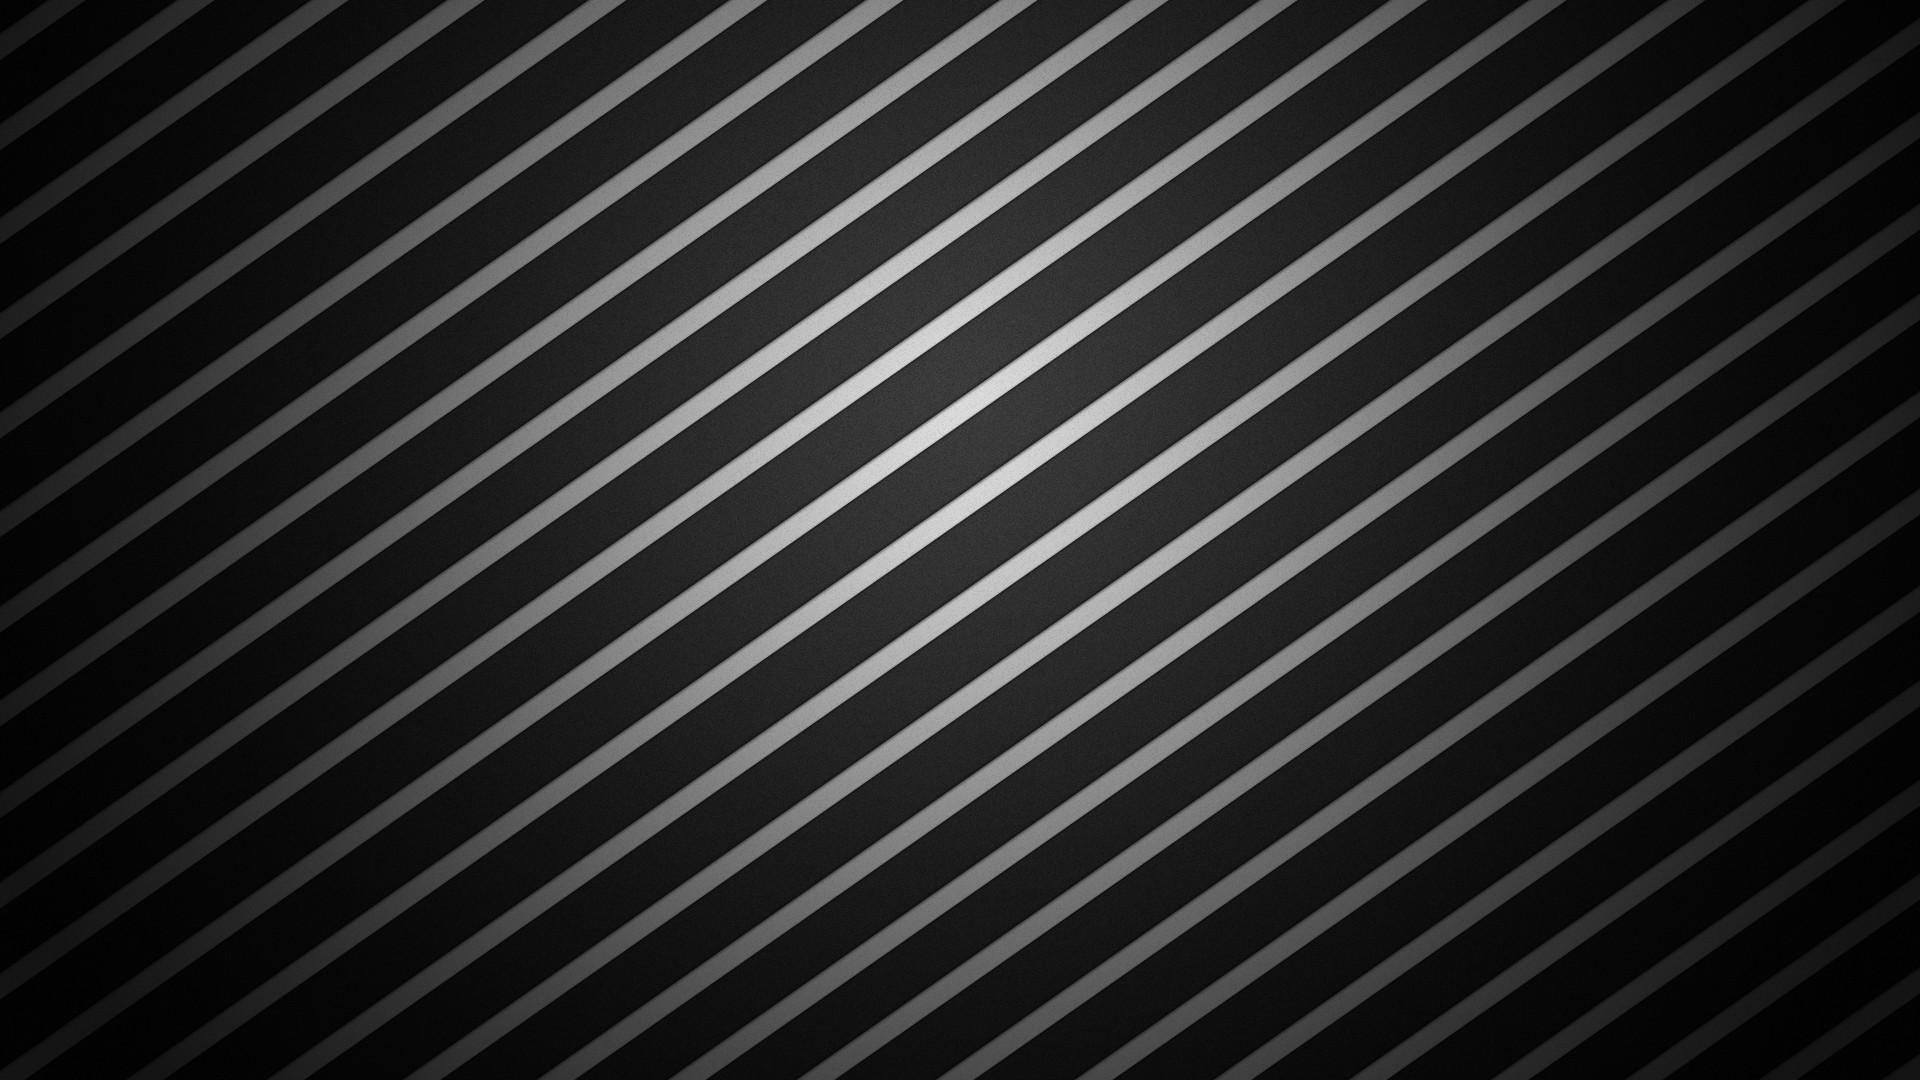 Wallpapers abstrait noir et blanc maximumwallhd for Lampe noir et blanc